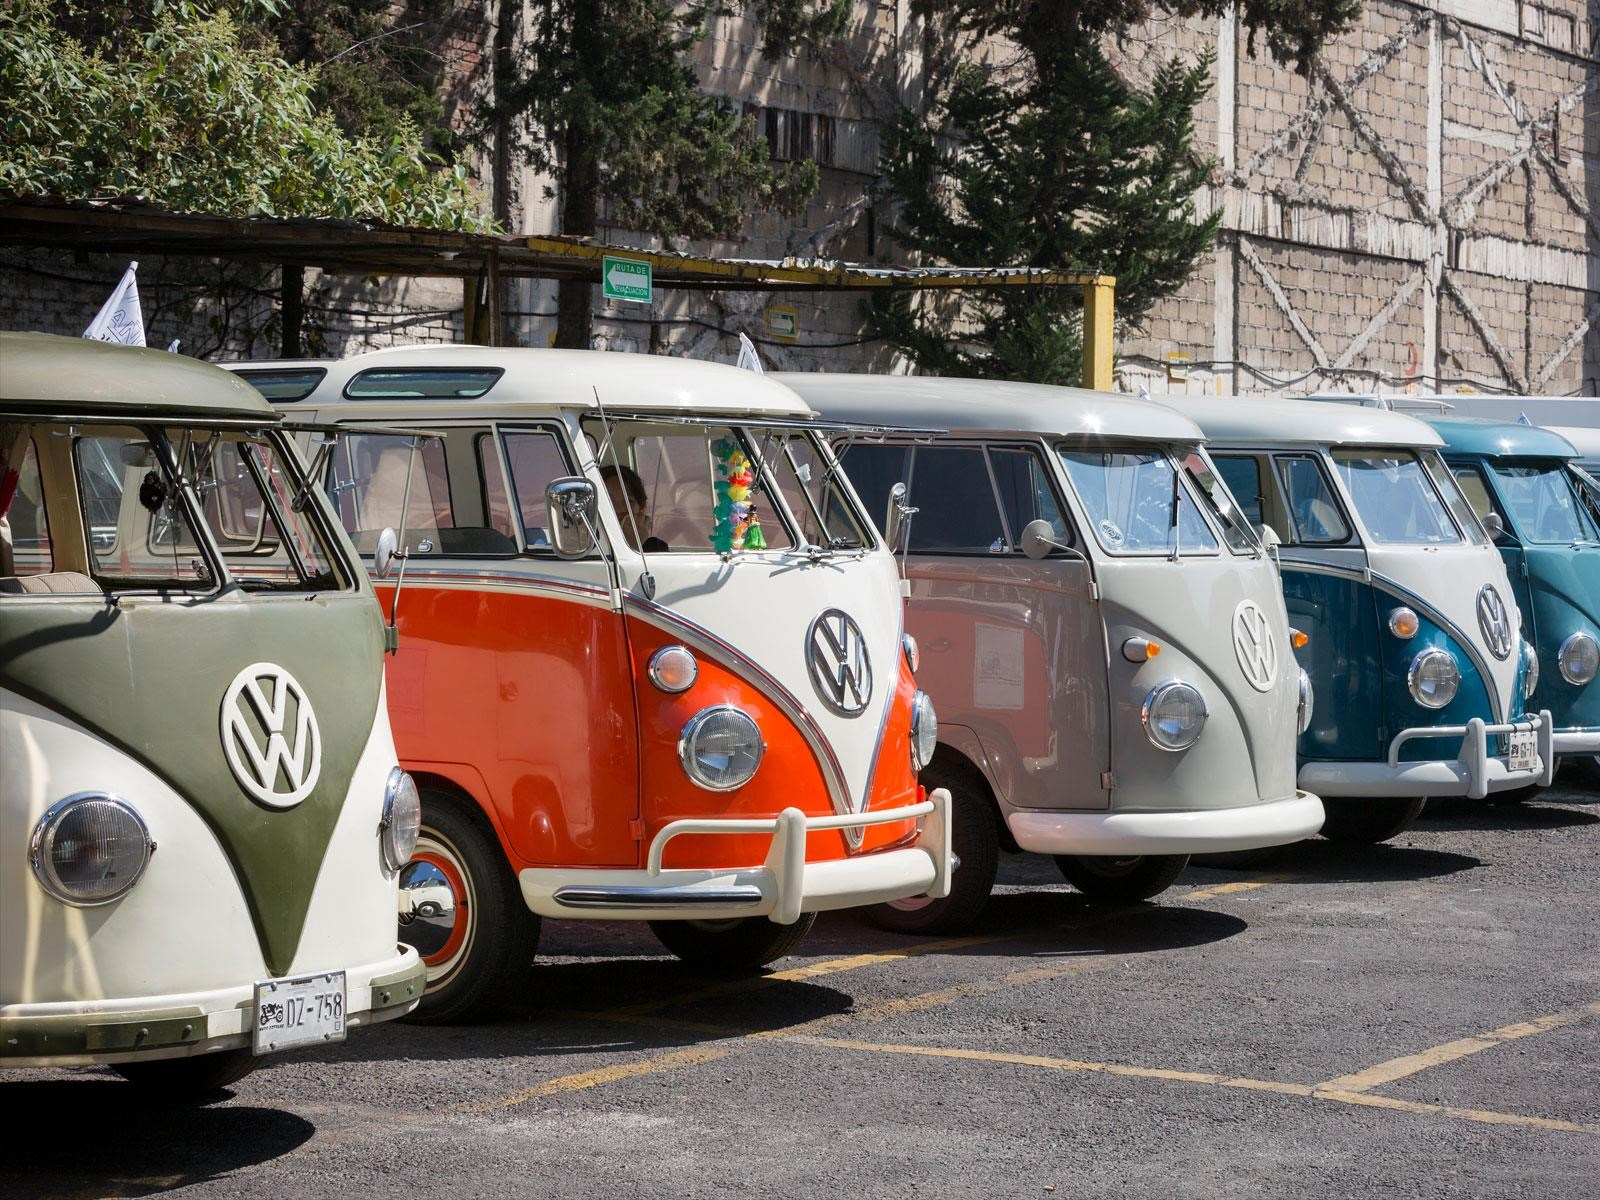 Volkswagen Kombi celebra su 70 aniversario